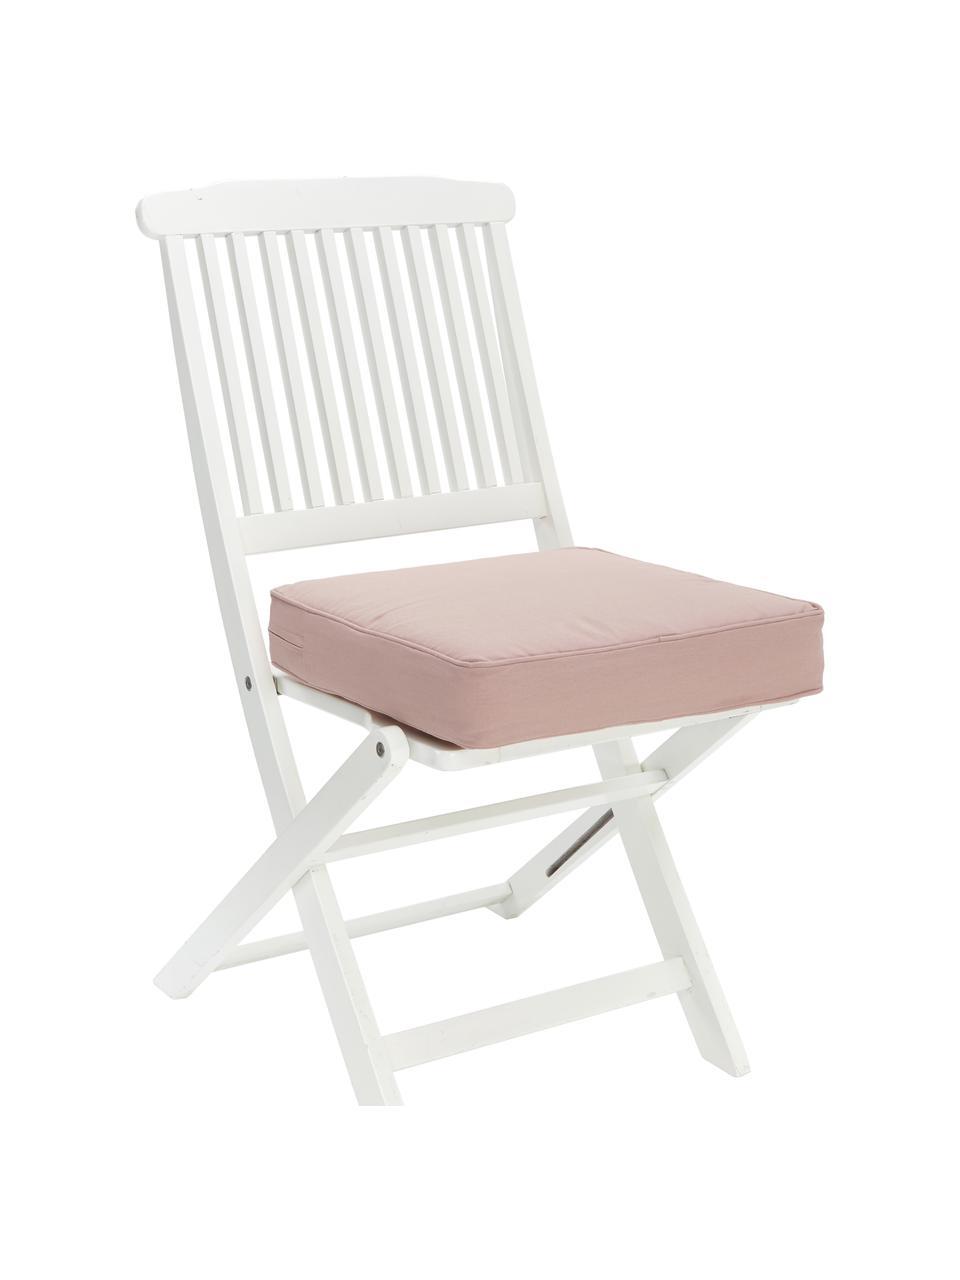 Sitzkissen Zoey in Altrosa, Bezug: 100% Baumwolle, Rosa, 40 x 40 cm